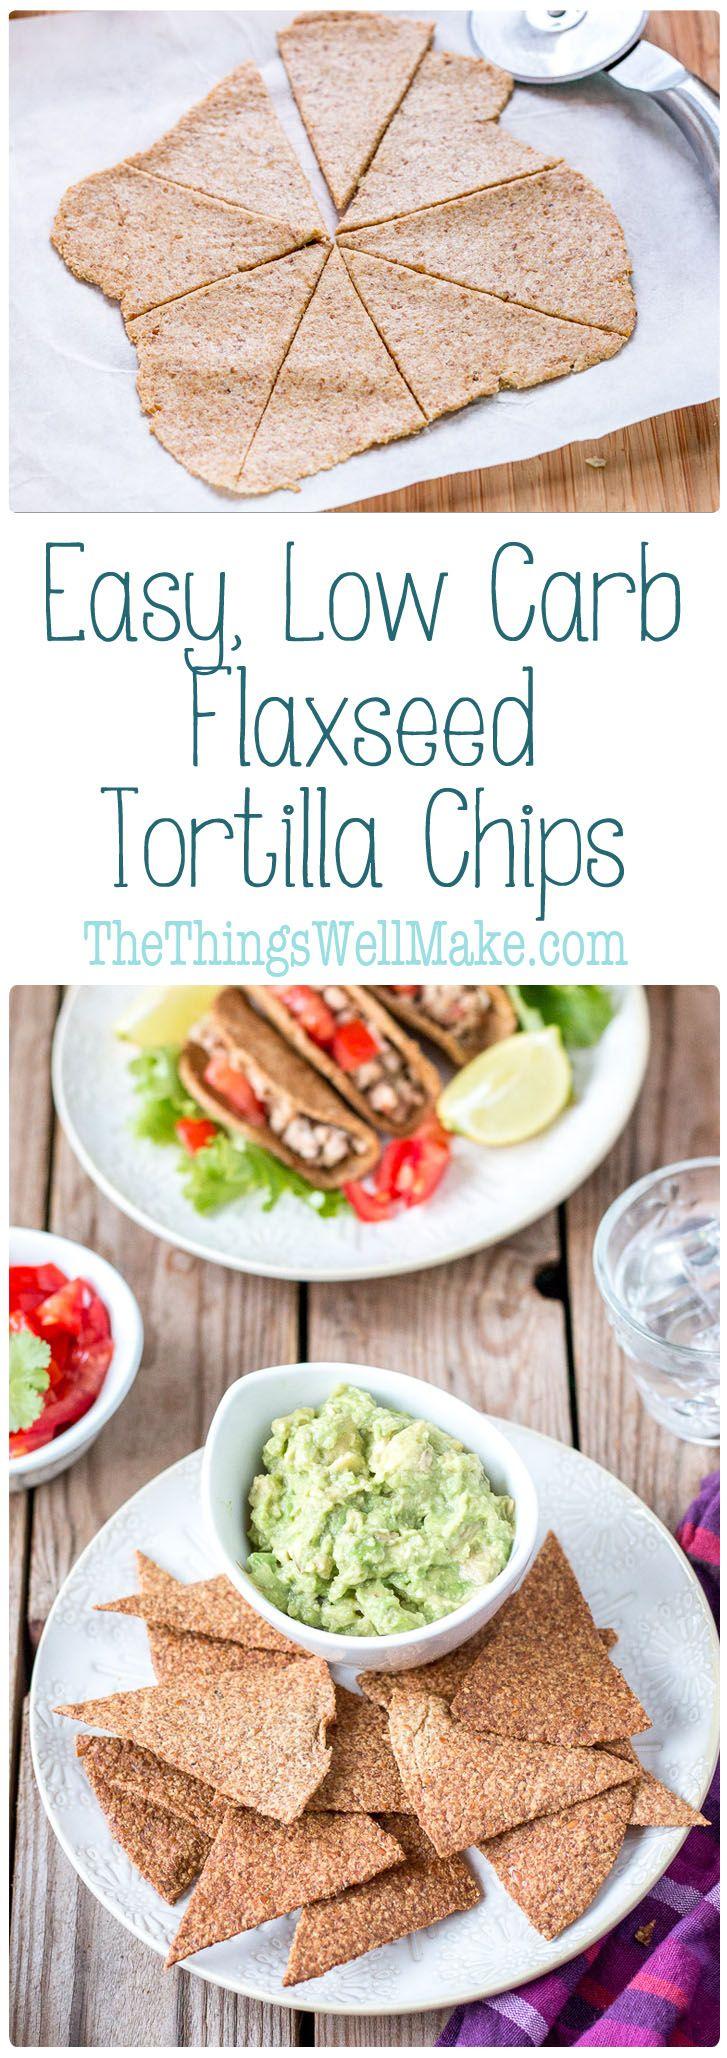 Low Carb, Flaxseed, Paleo Tortilla Chips and Taco Shells #flaxseedmealrecipes